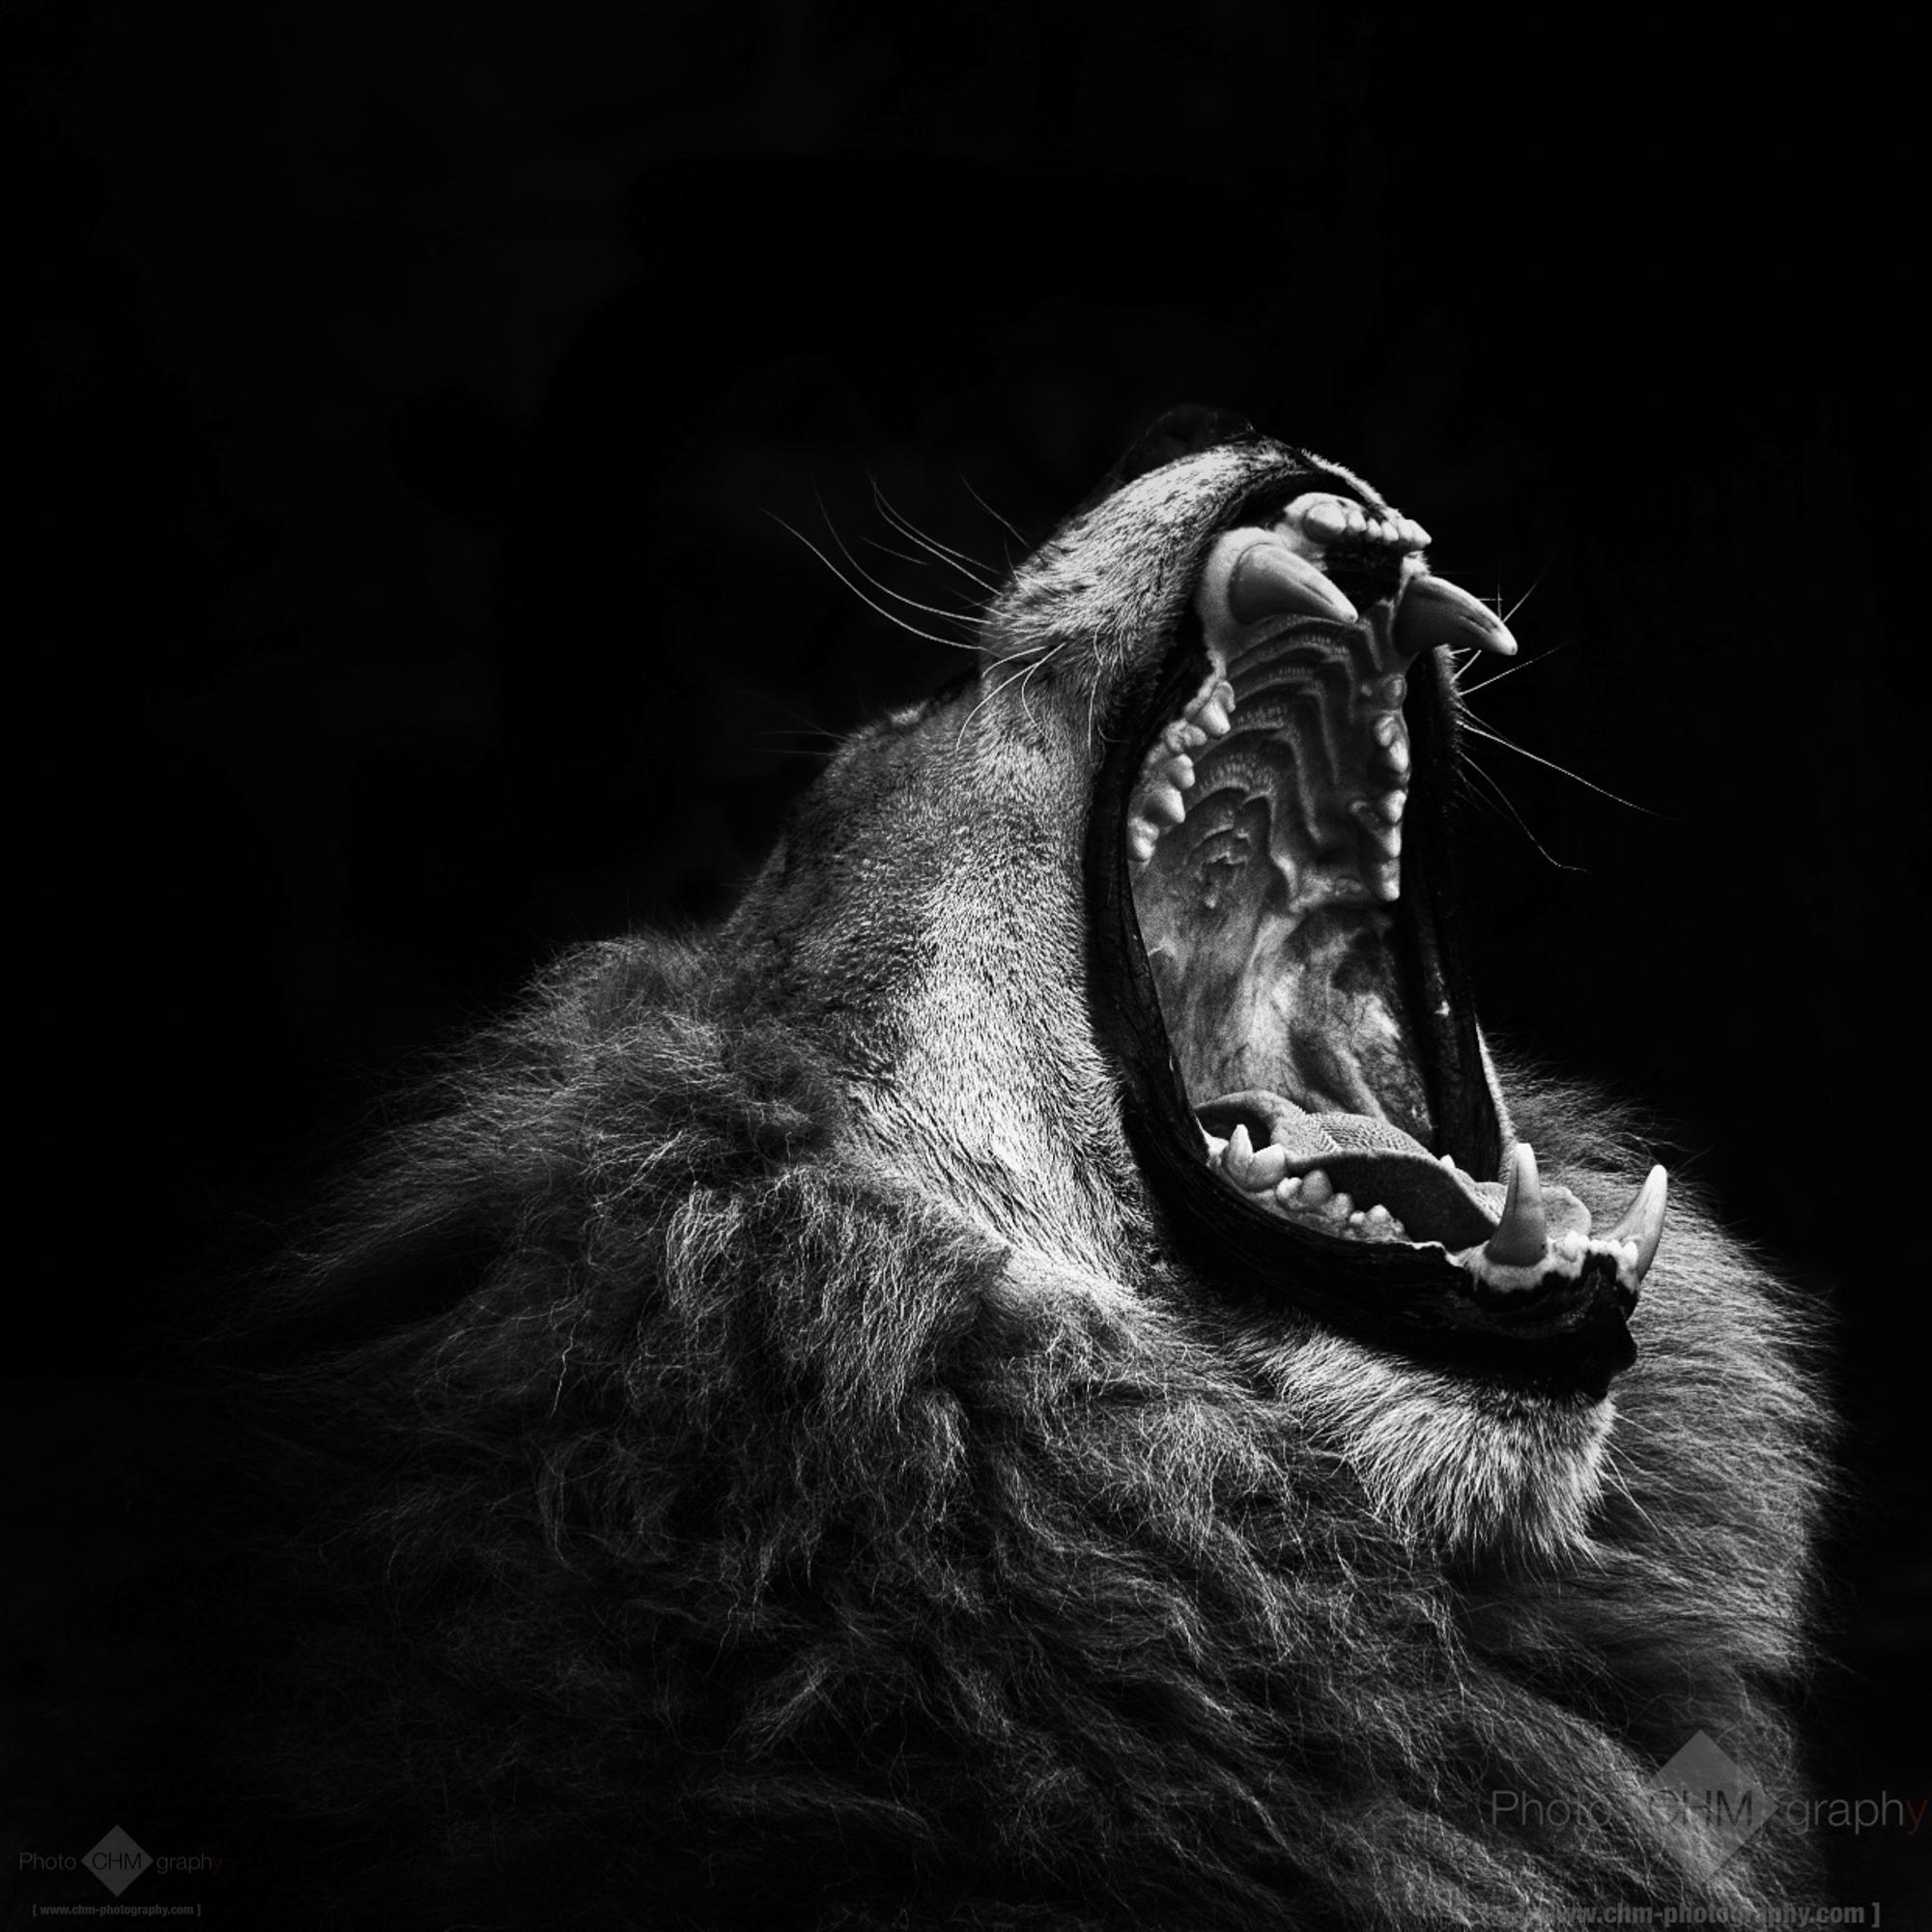 primal yawn lion 3 chm photography